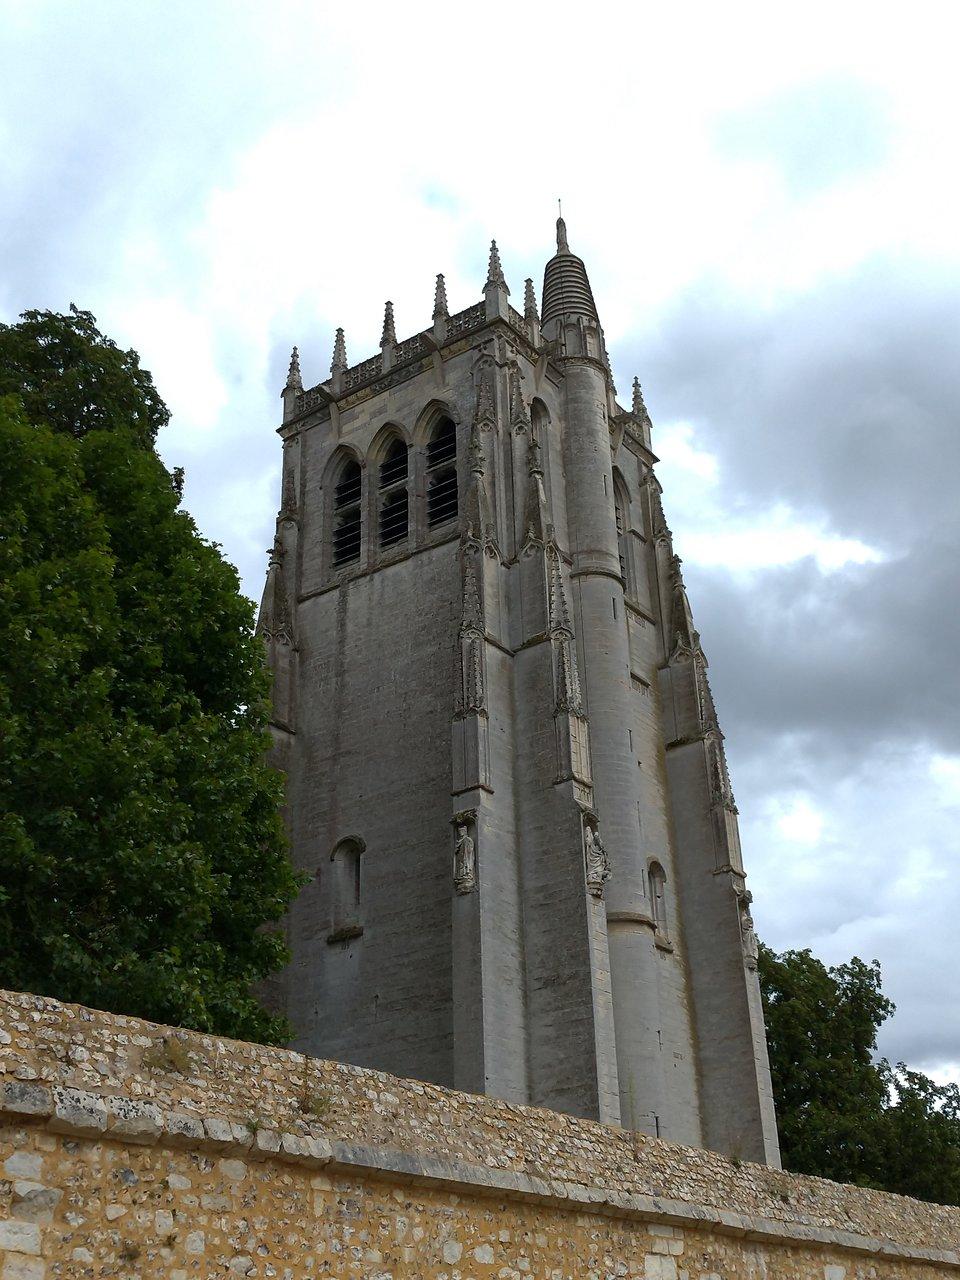 Abbaye Bec-hellouin Scandale : abbaye, bec-hellouin, scandale, Magasin, Photo, Abbaye, Bec-Hellouin,, Bec-Hellouin, Tripadvisor